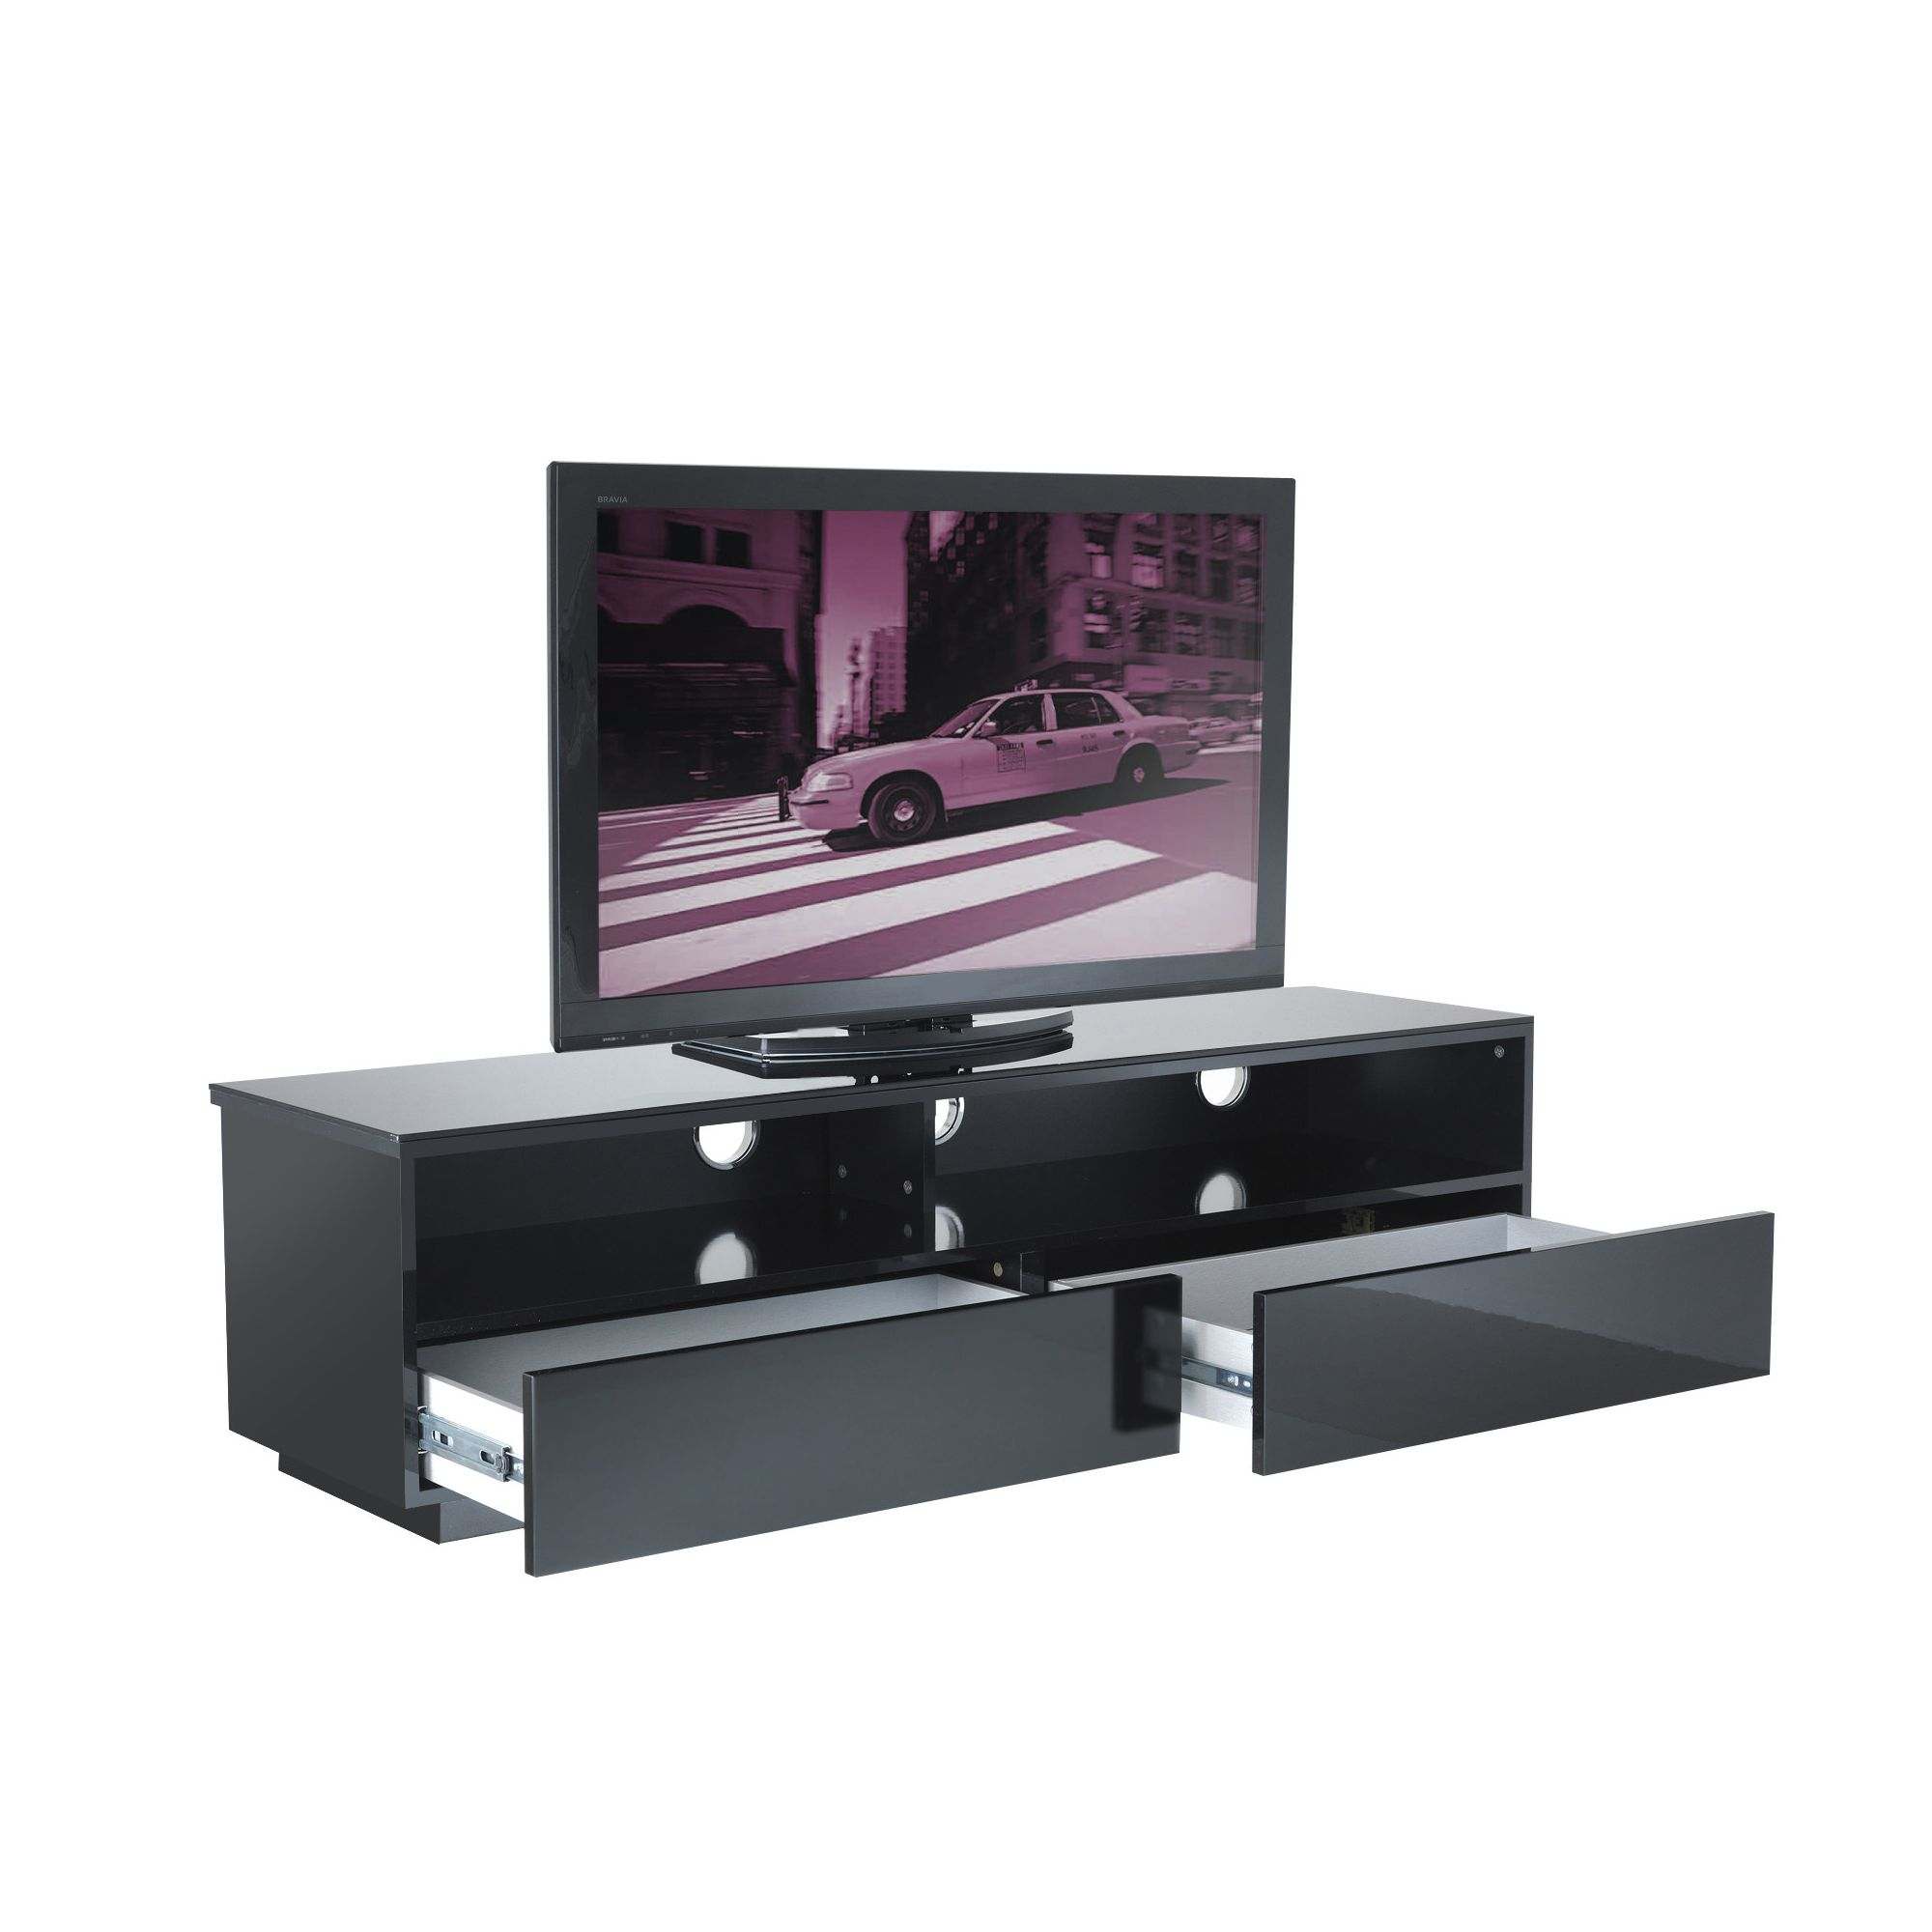 UK-CF Cityscape New York TV Stand - Black at Tesco Direct